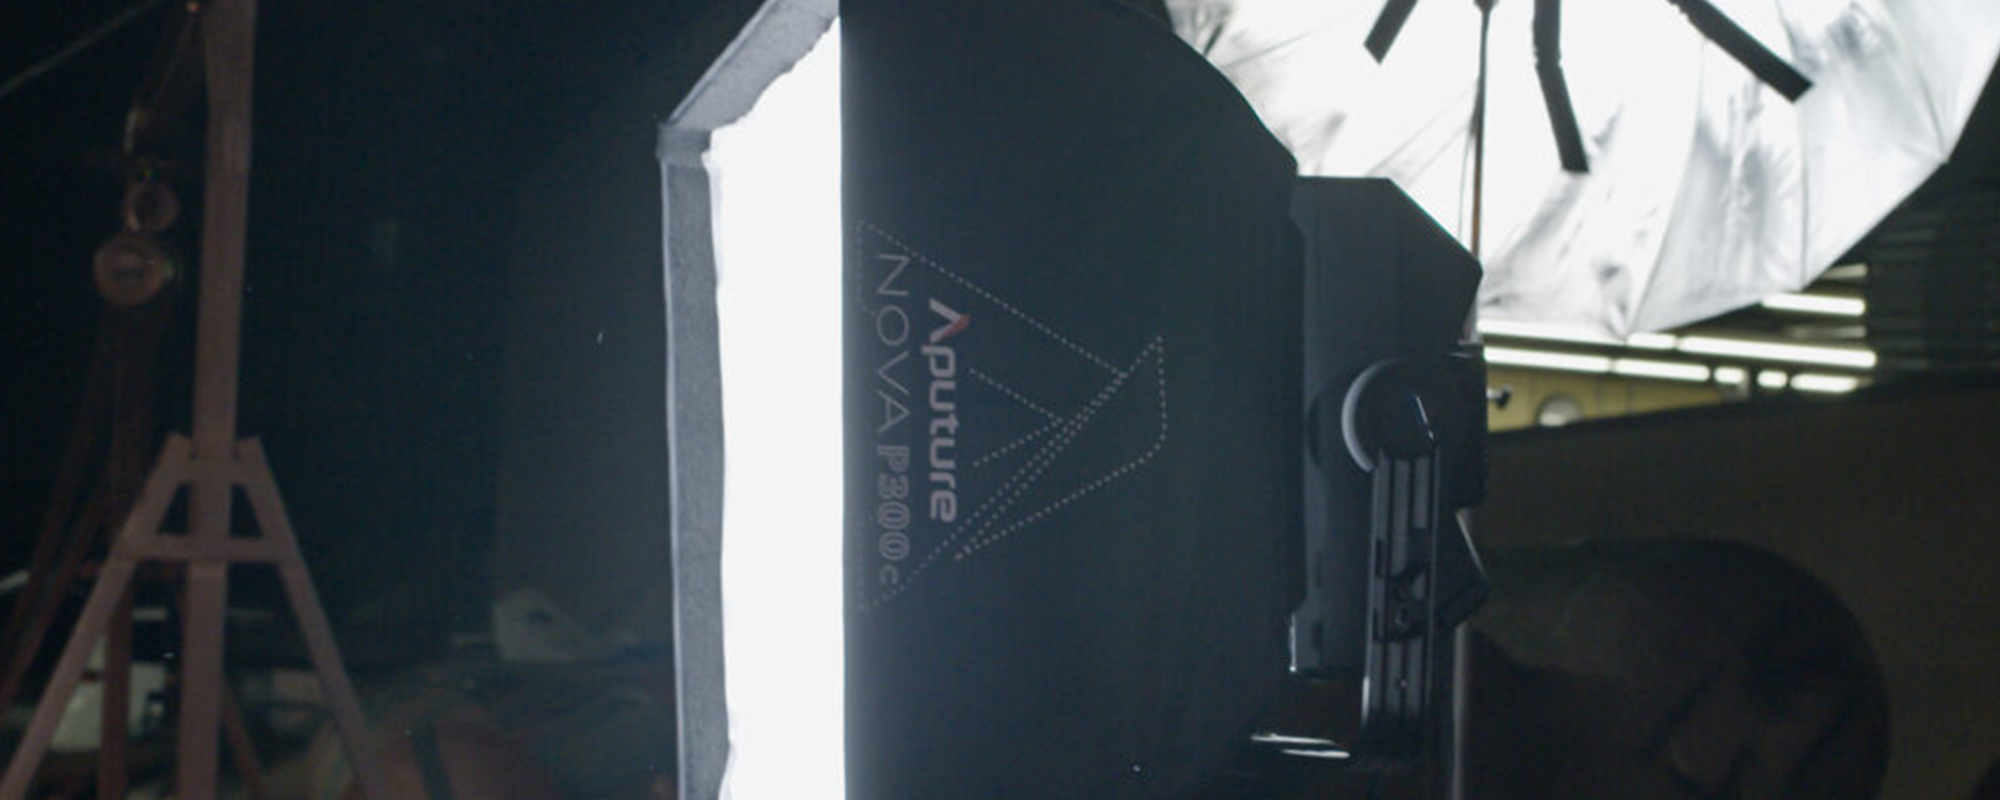 Softbox Aputure Nova do lamp P300c widok z boku